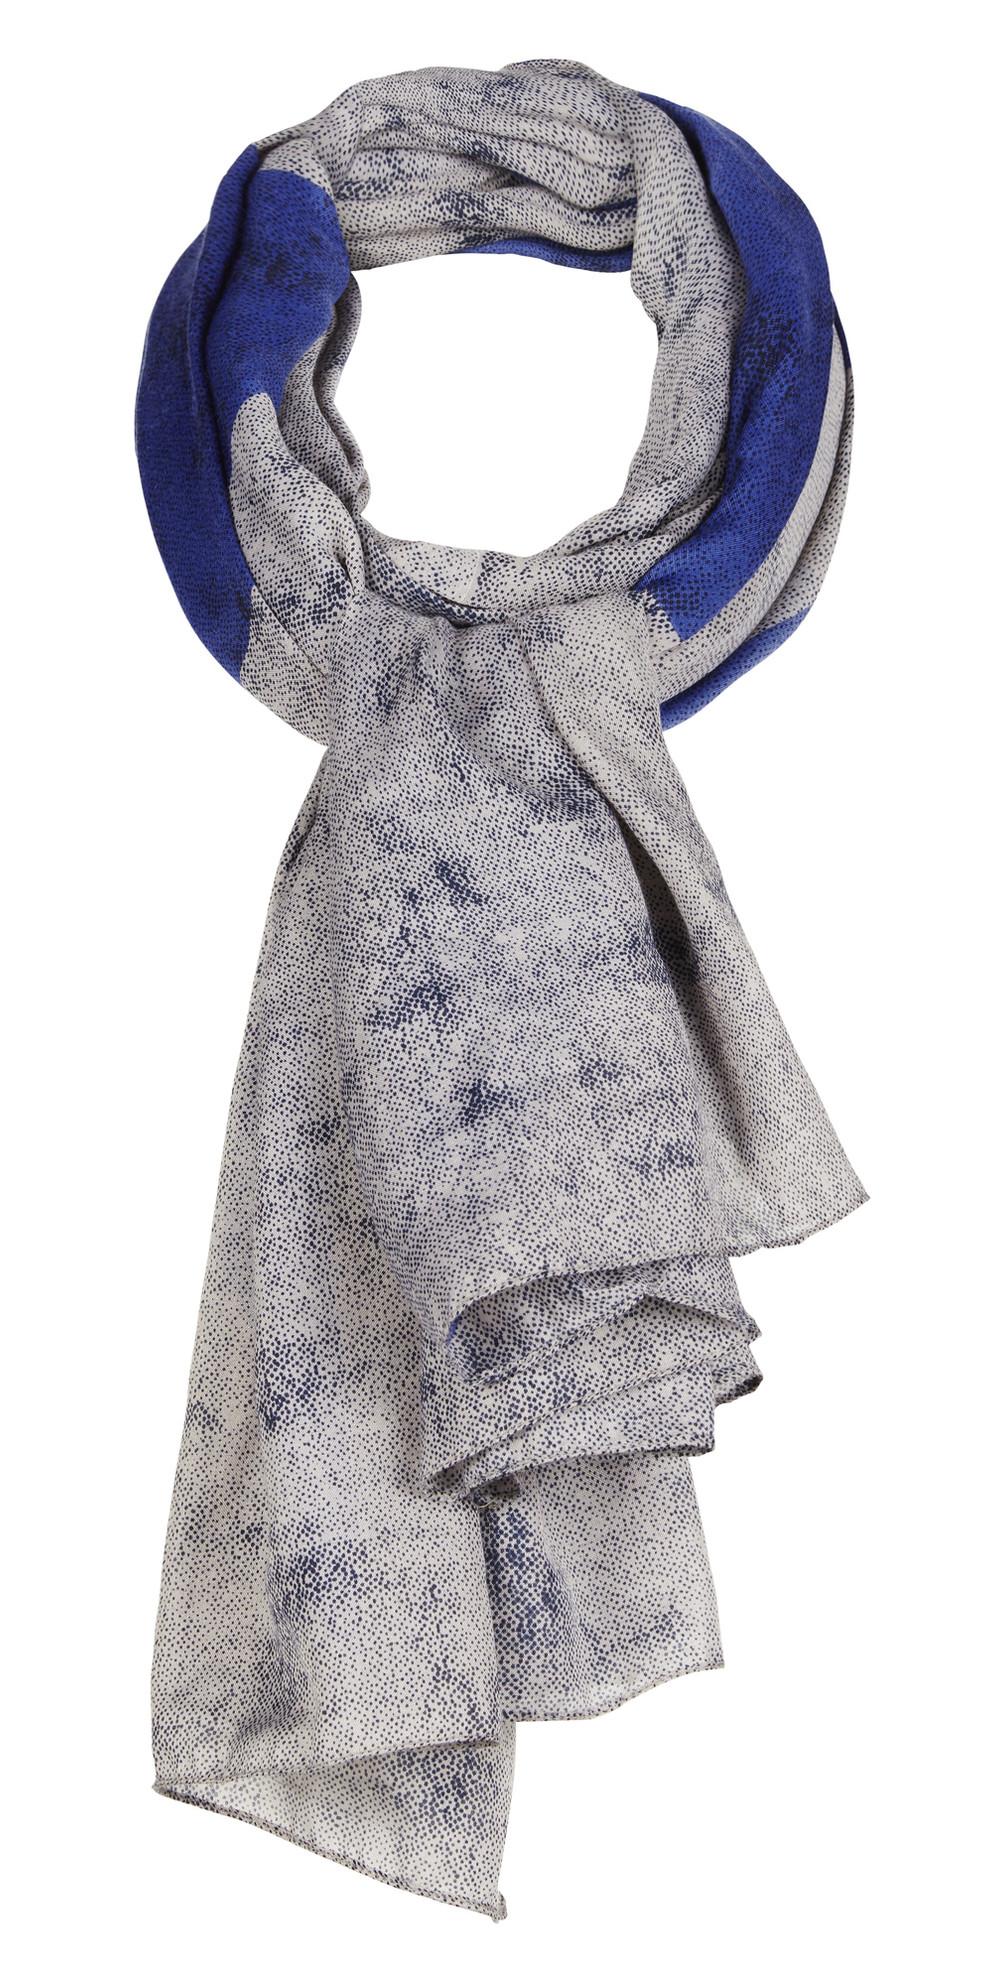 blue star clothing company scarfs - photo #16